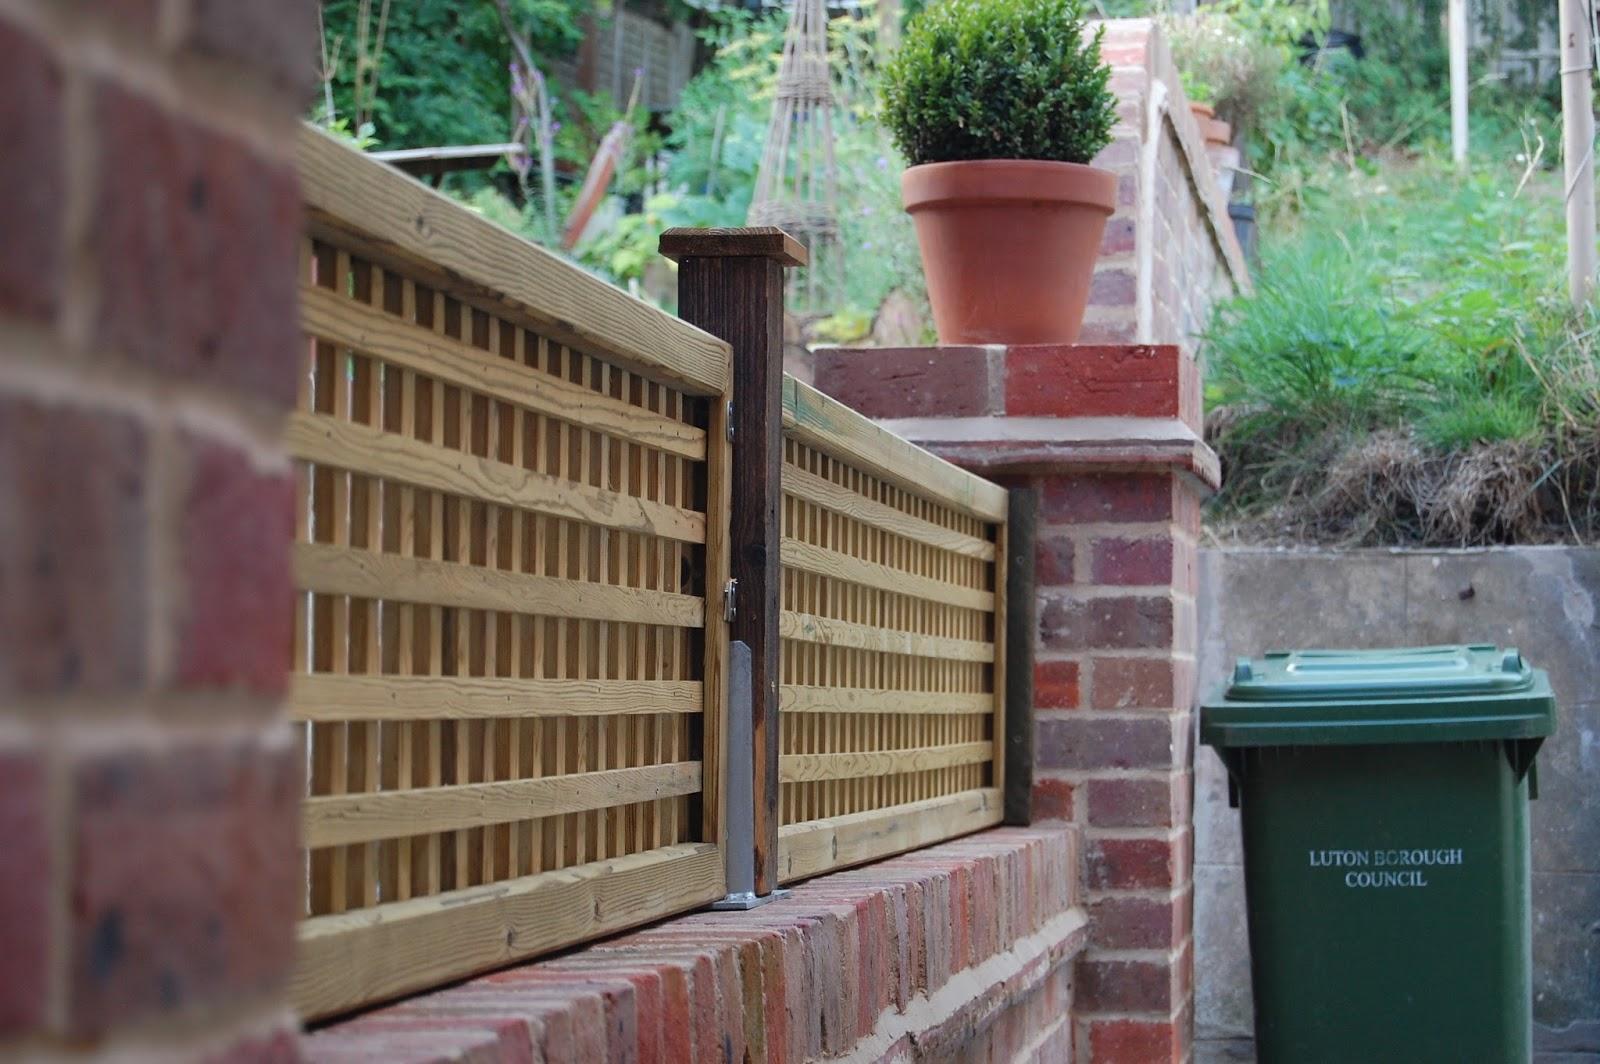 Lattice Trellis Fixed On Brick Wall How To Reset A